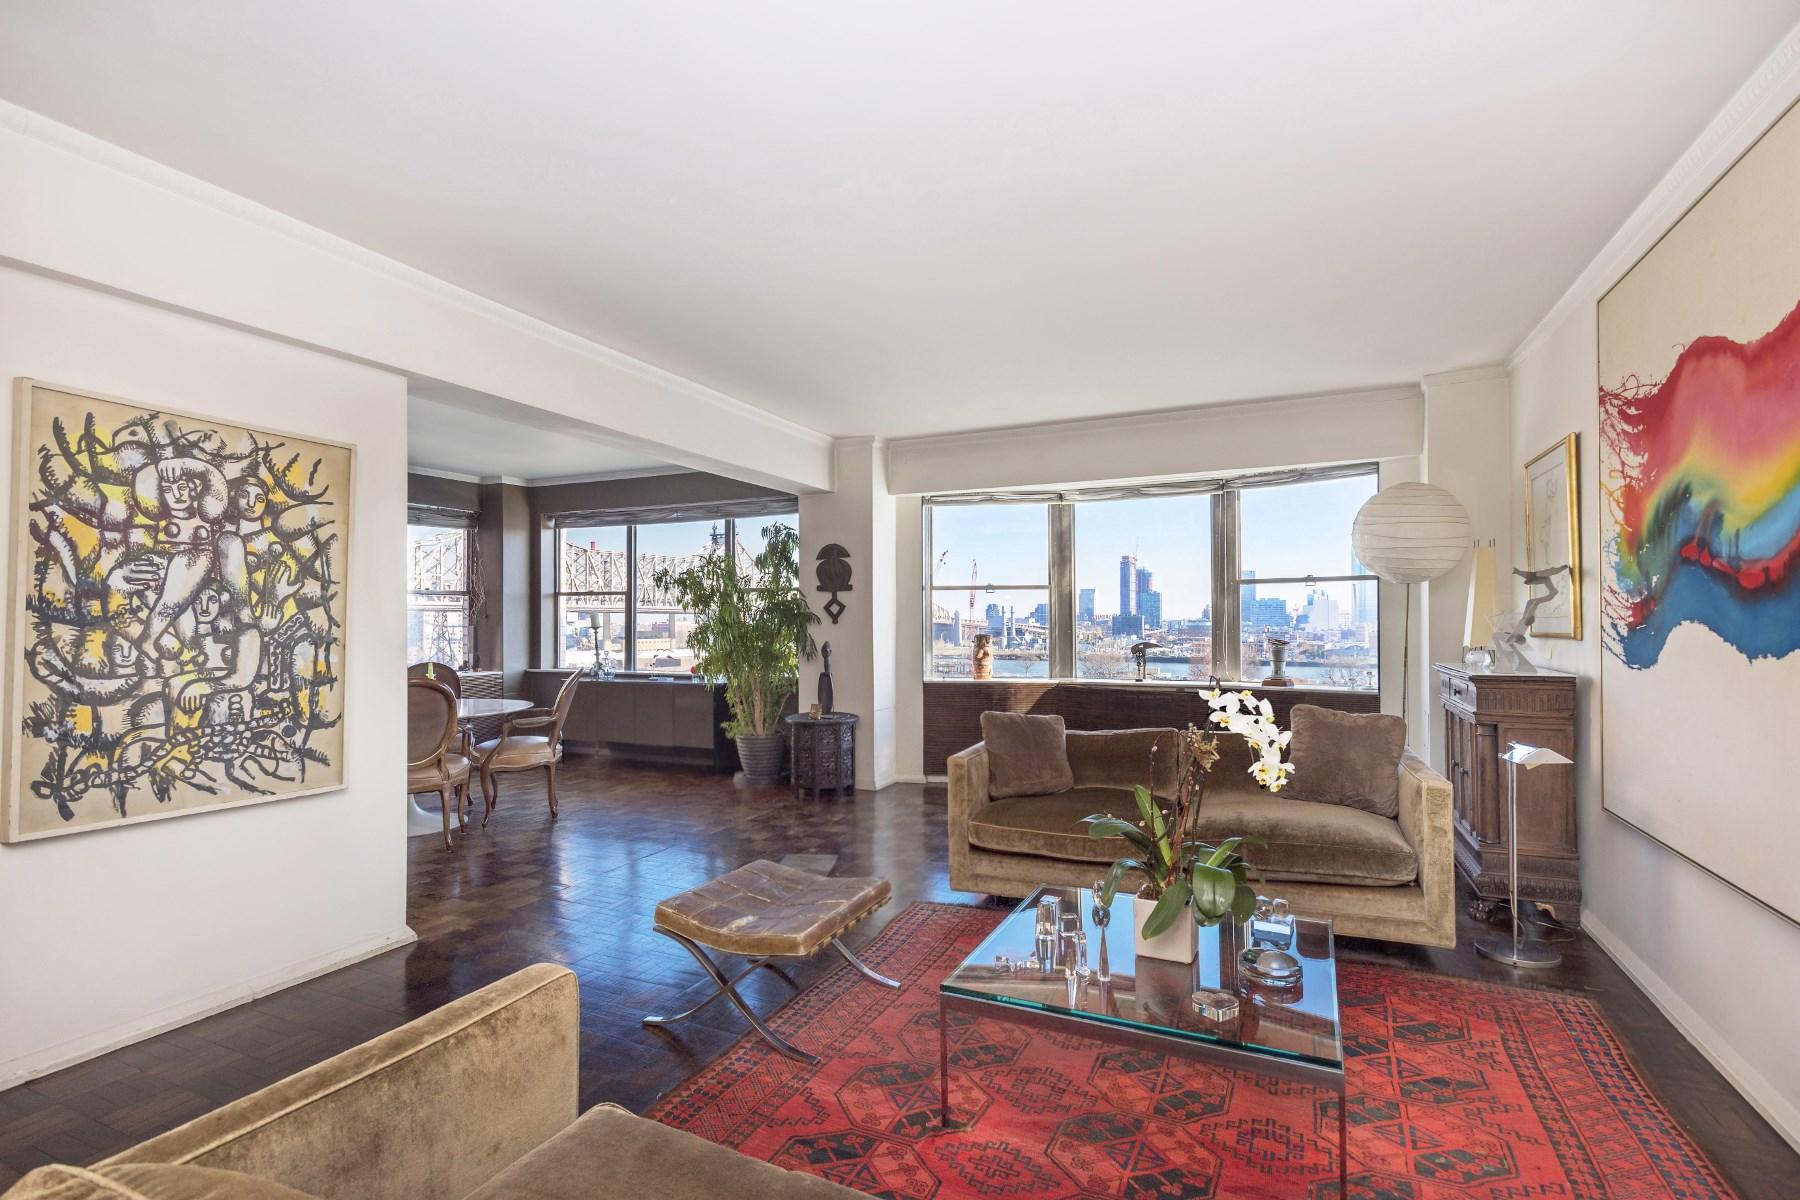 Кооперативная квартира для того Продажа на Sutton Place: Magnificent River Views 45 Sutton Place South Apt 10E Sutton Place, New York, Нью-Йорк, 10022 Соединенные Штаты